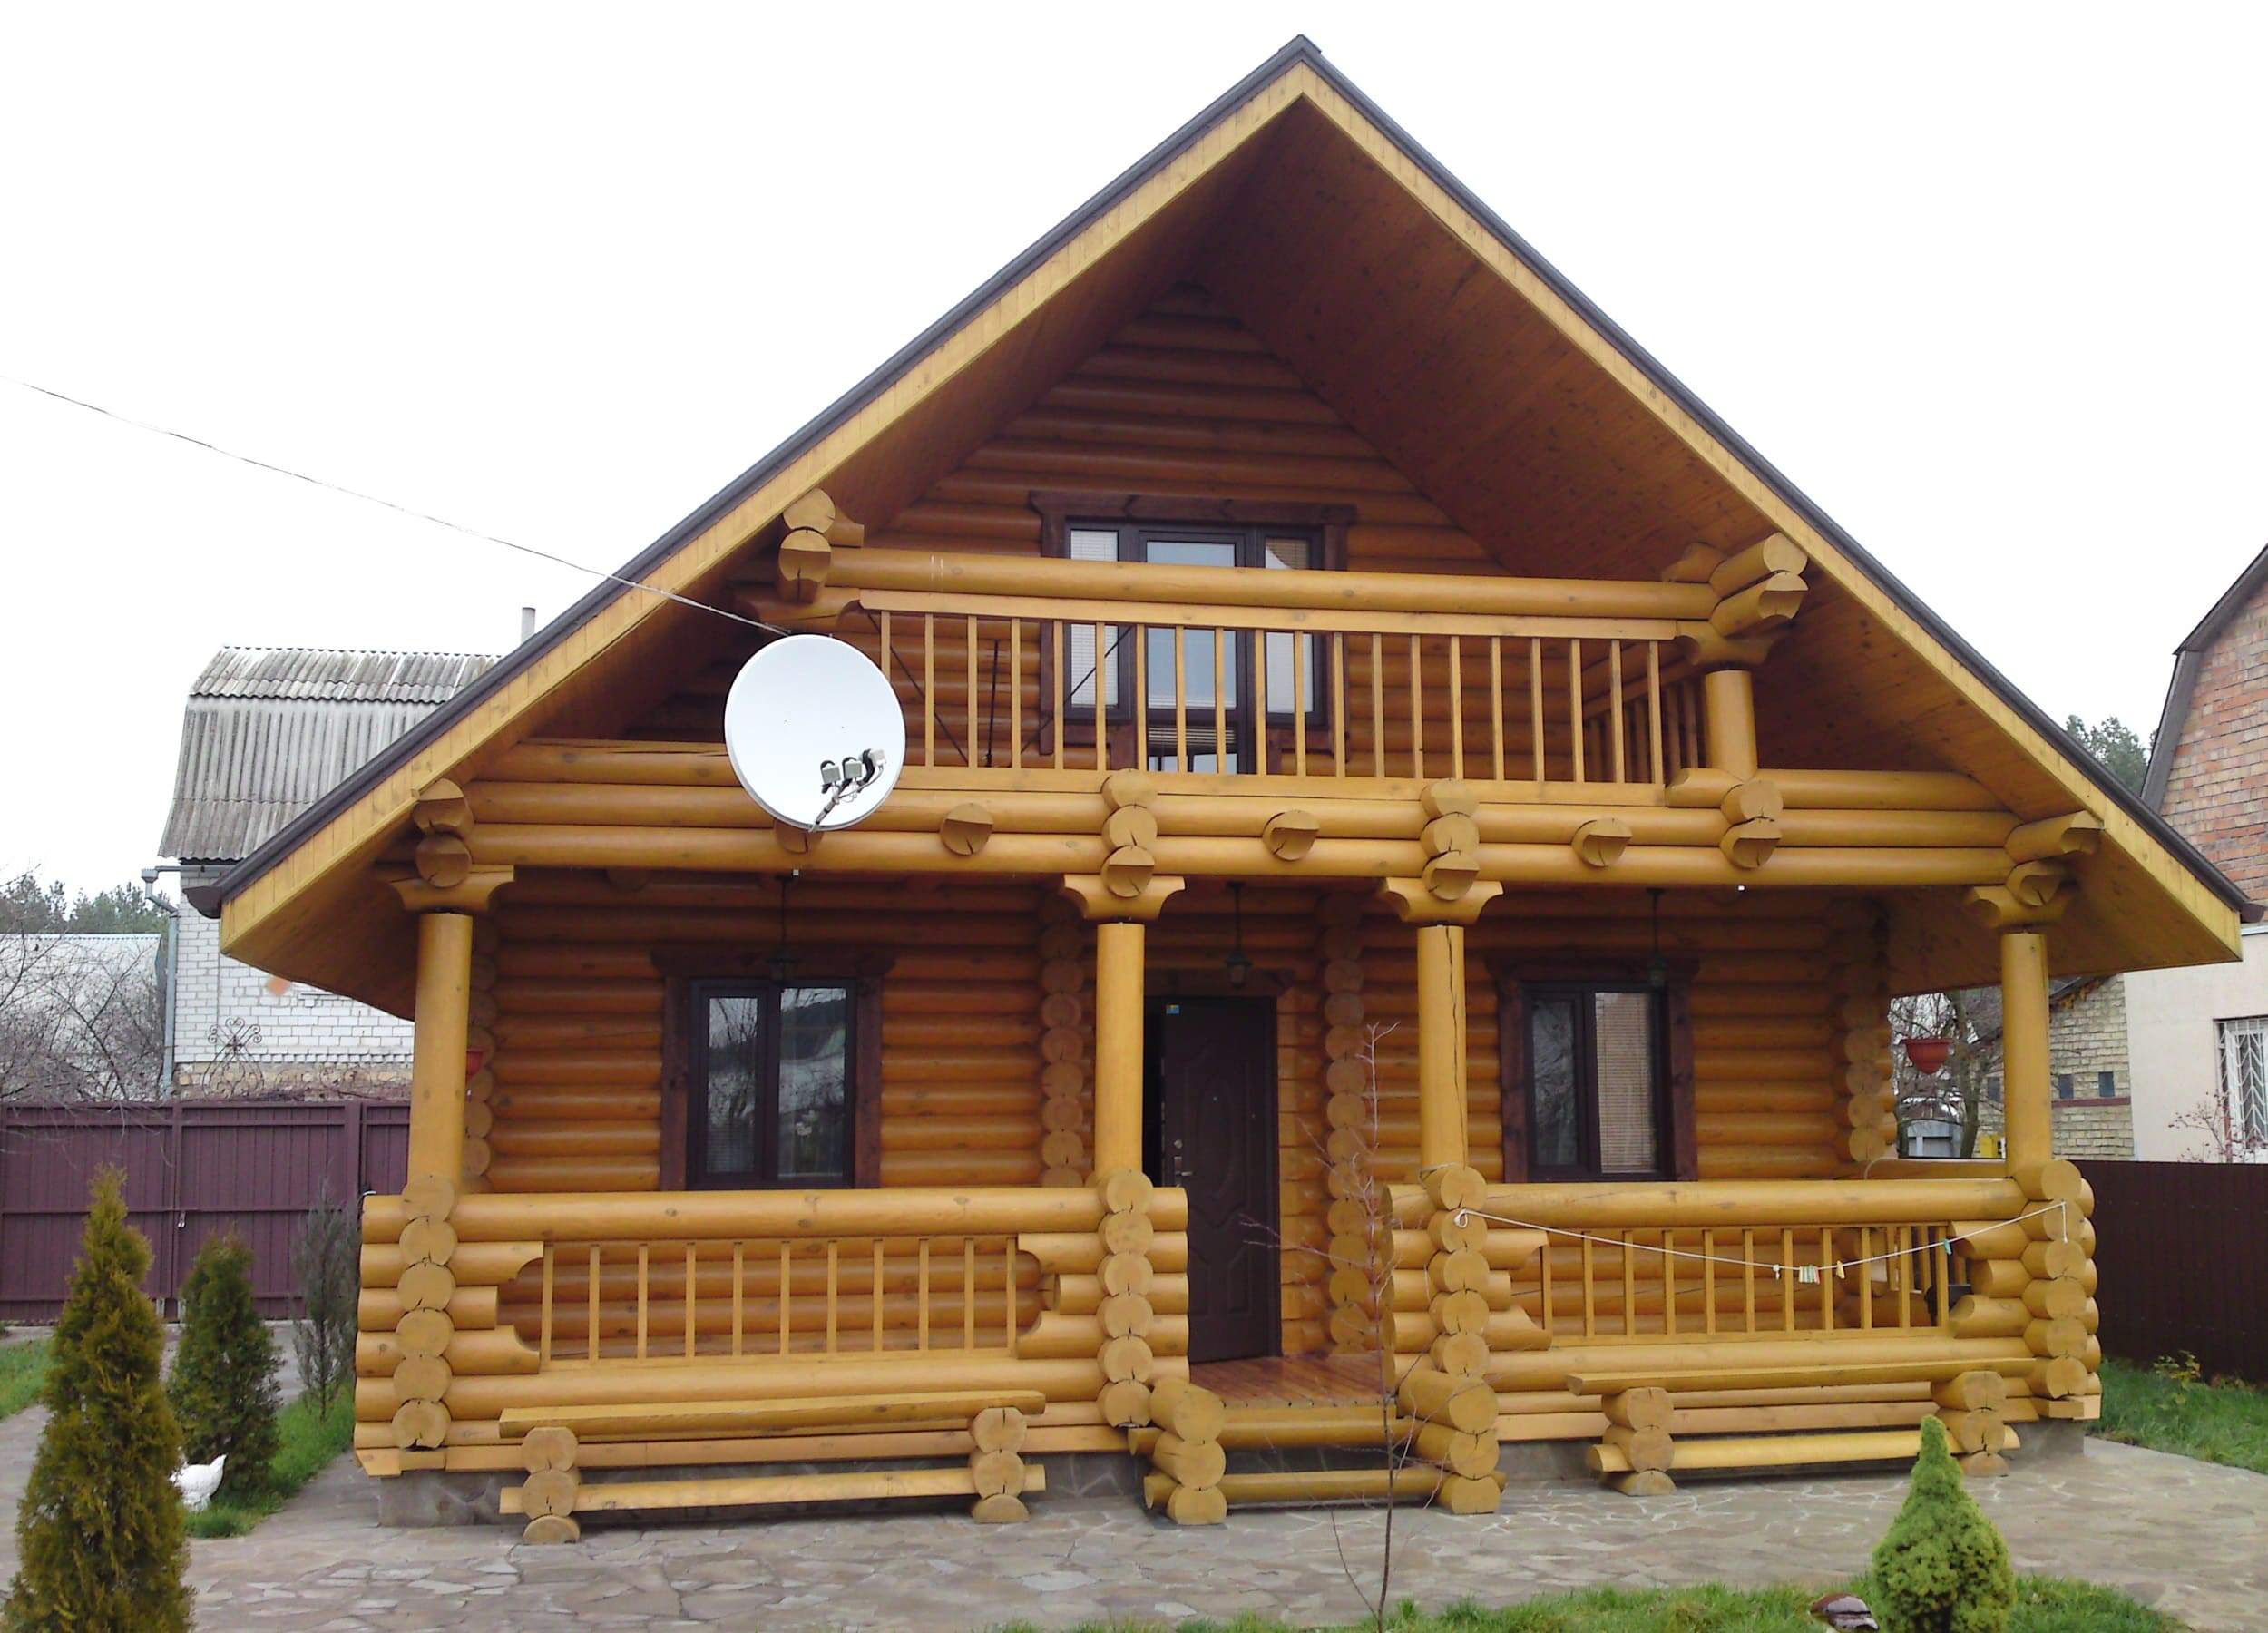 Ипотека от 2,7% на строительство дома в банках Нижнего Новгорода.